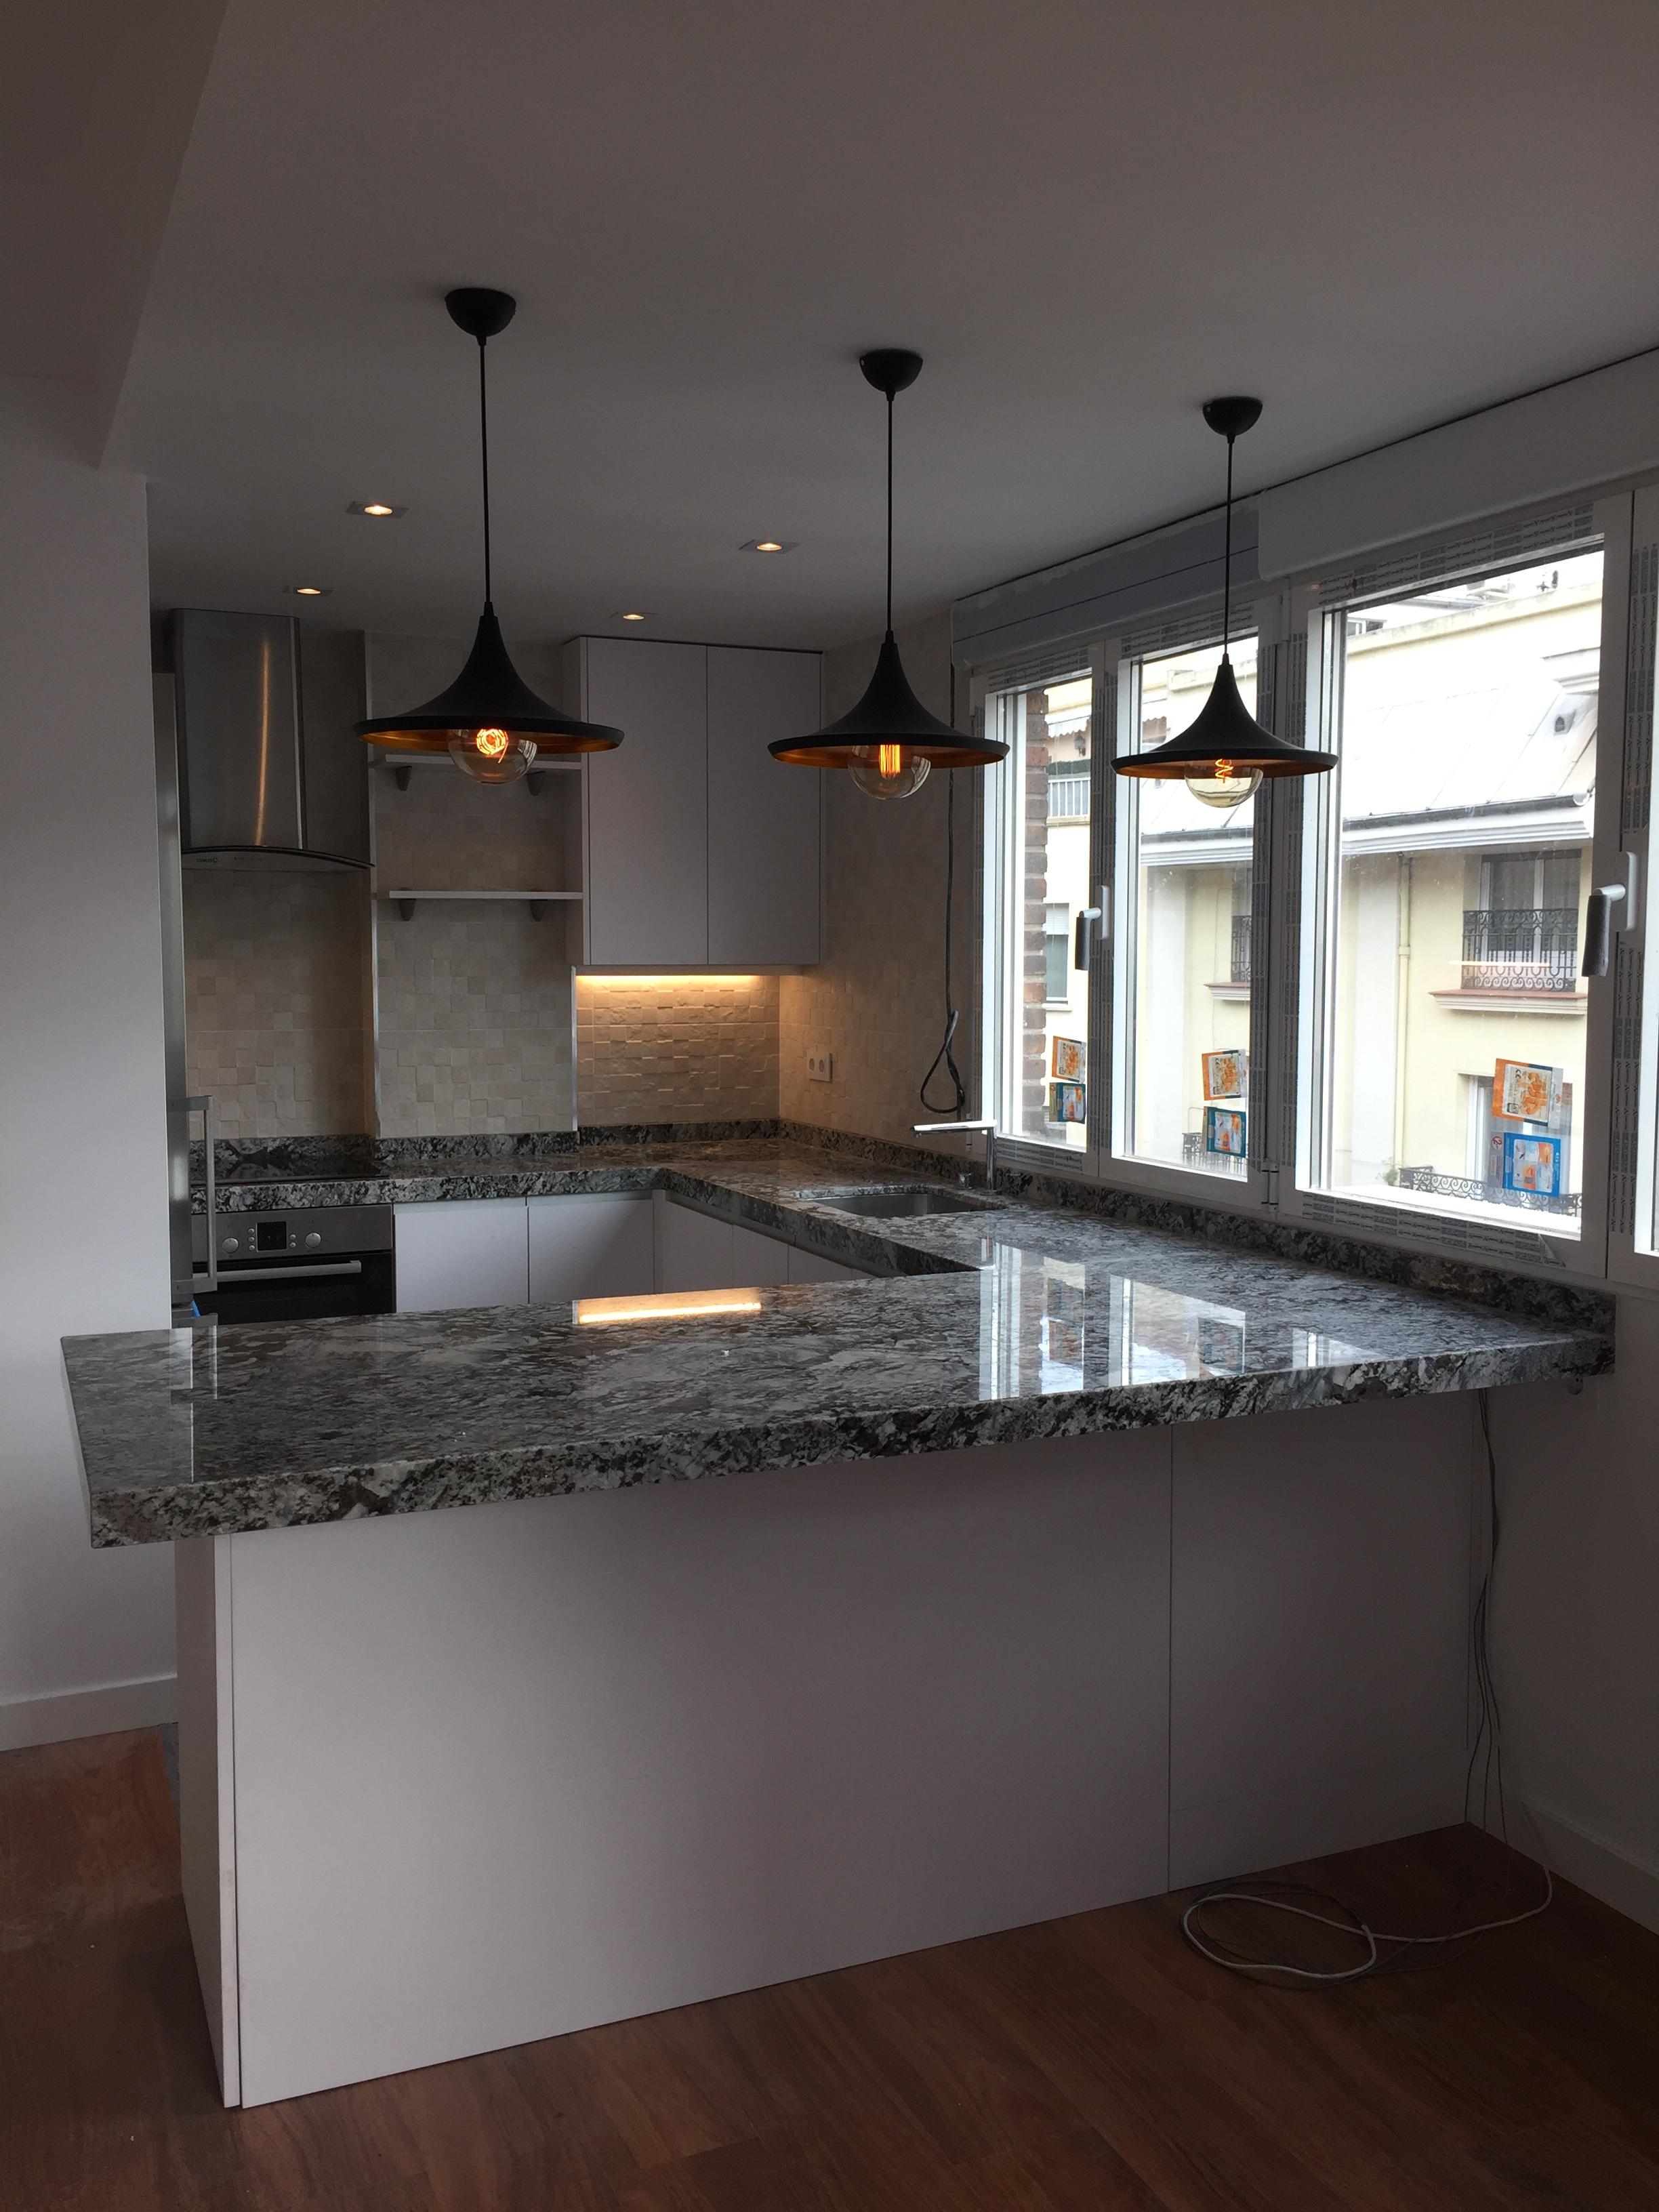 Precio reforma integral piso 100 metros latest free for Cuanto vale una reforma integral